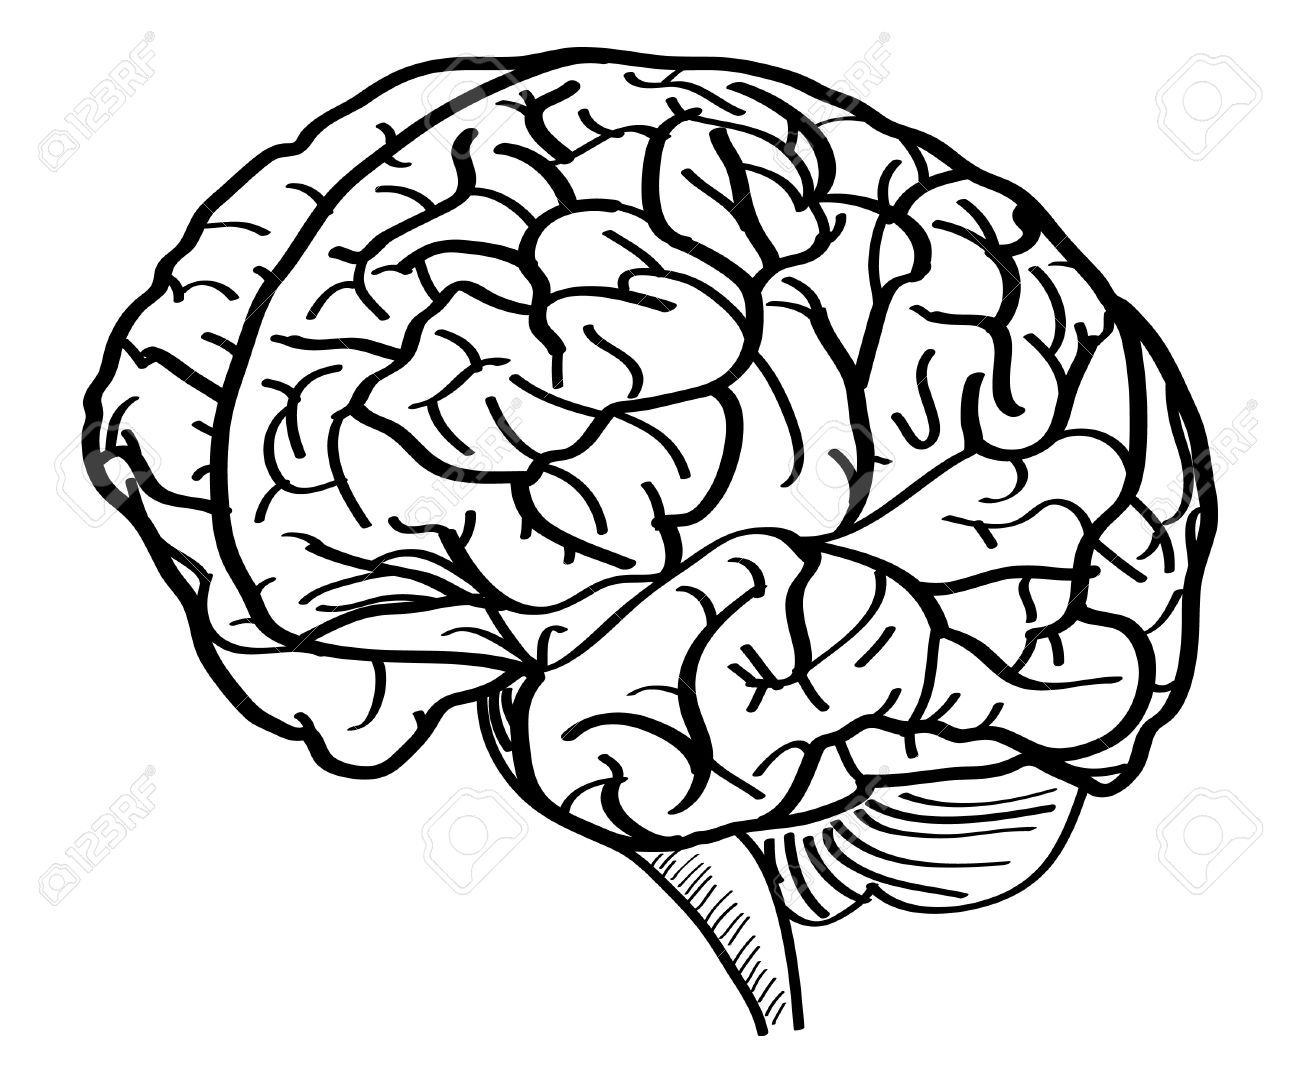 1300x1083 Brain Clipart Brain Outline